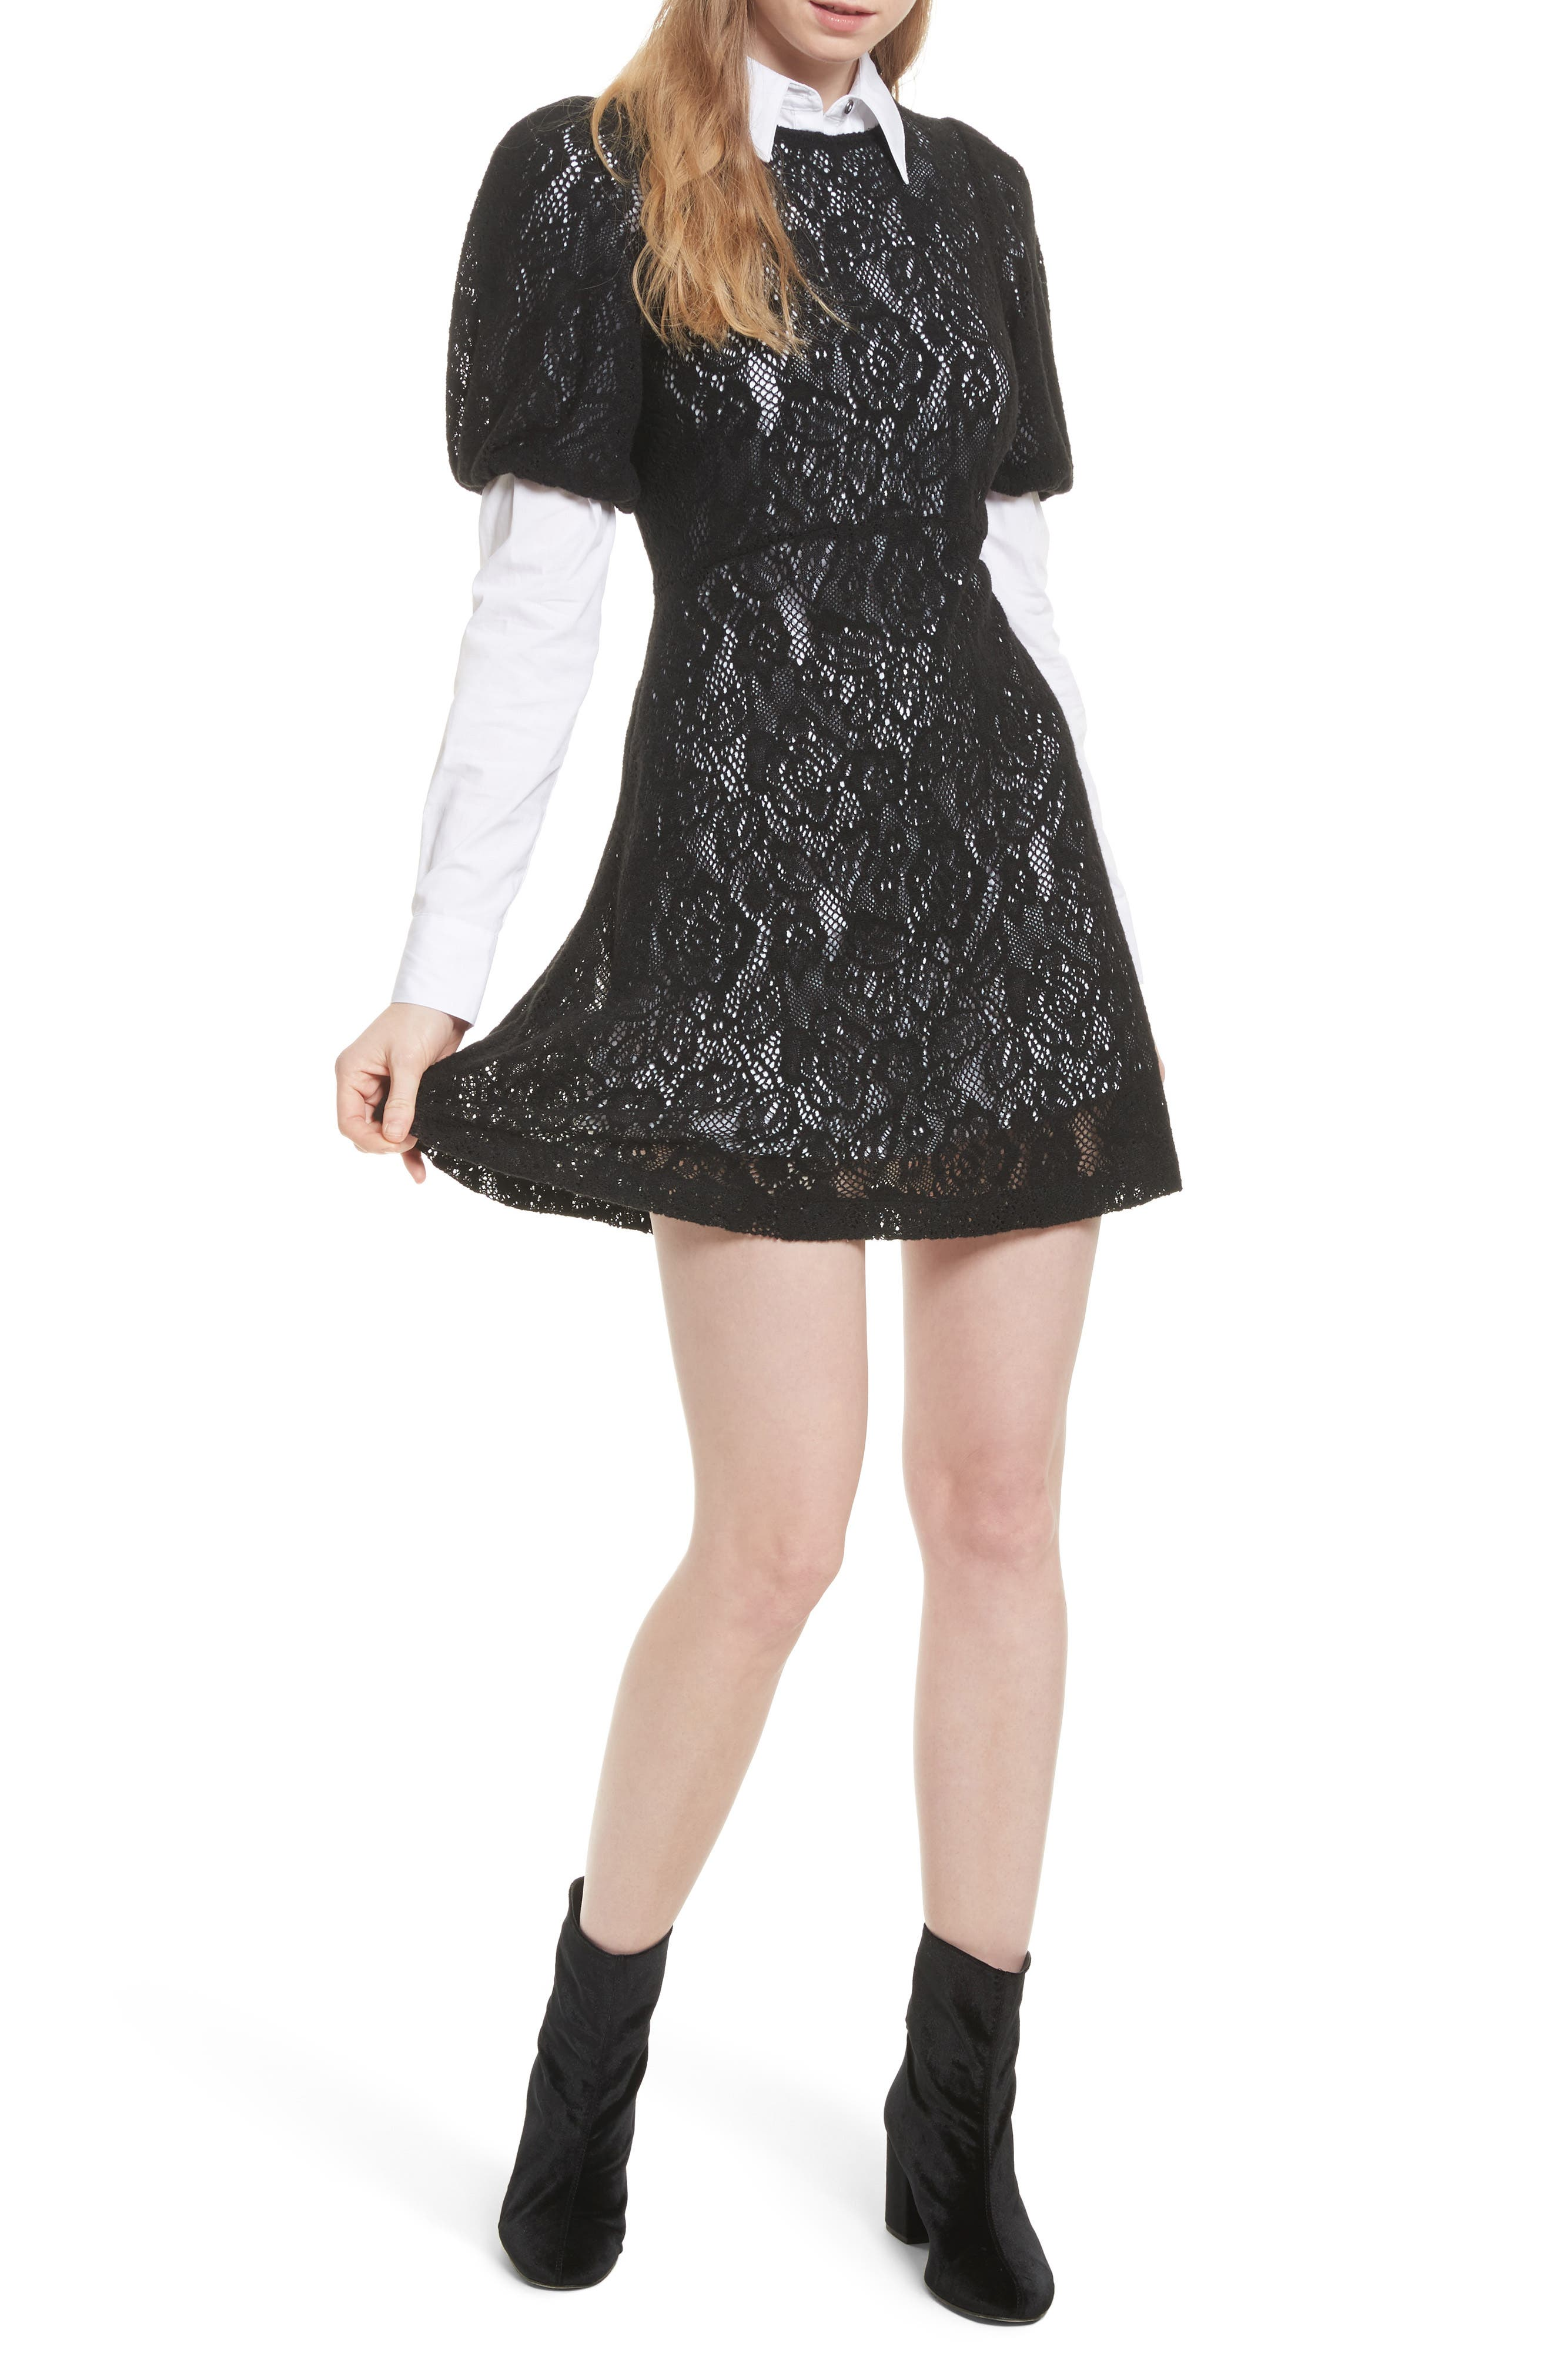 Pretty Princess Dress Shirtdress with Lace Overlay,                             Main thumbnail 1, color,                             019